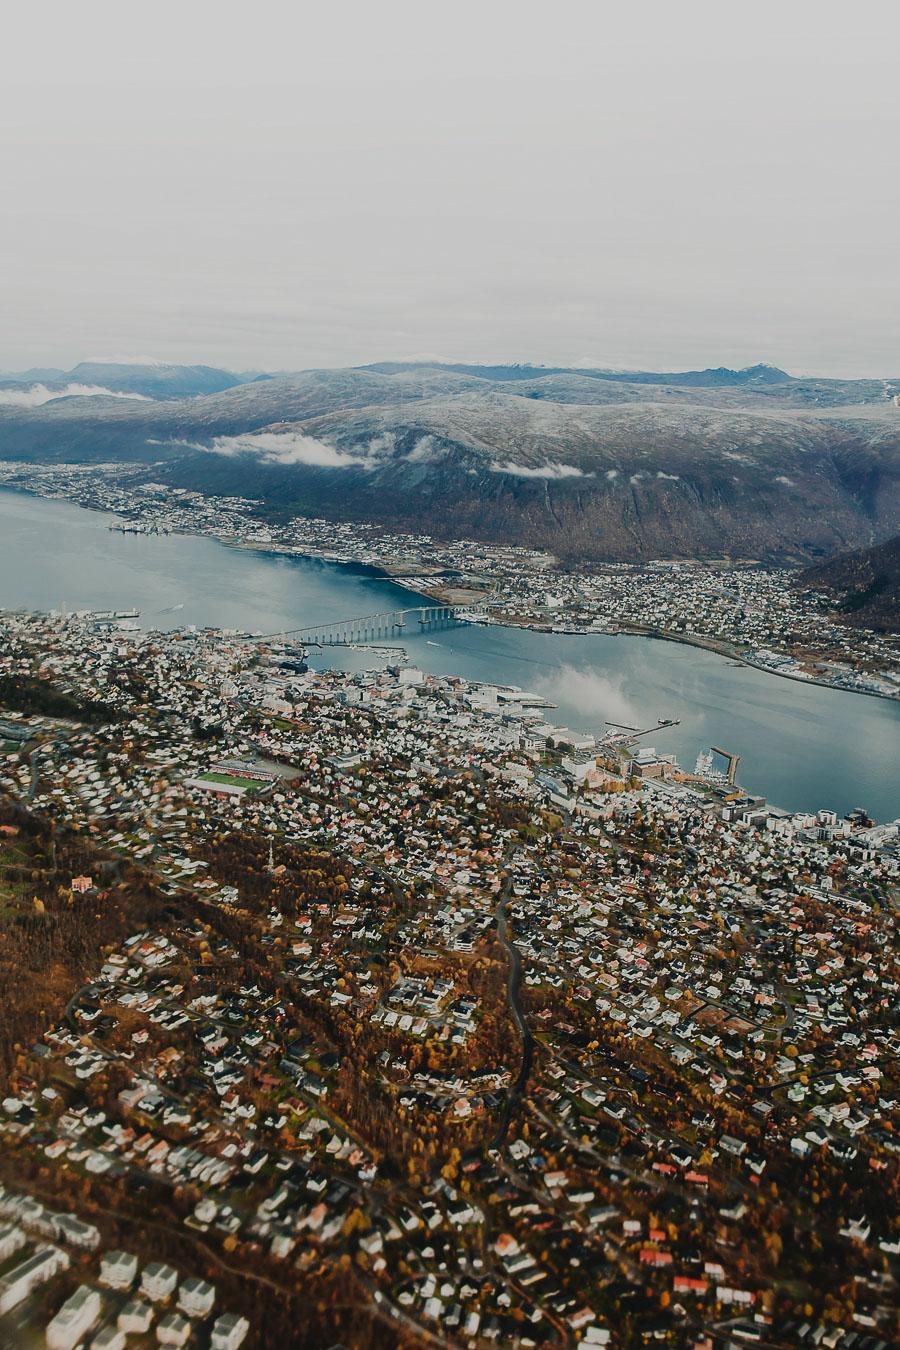 Tromsø from the air